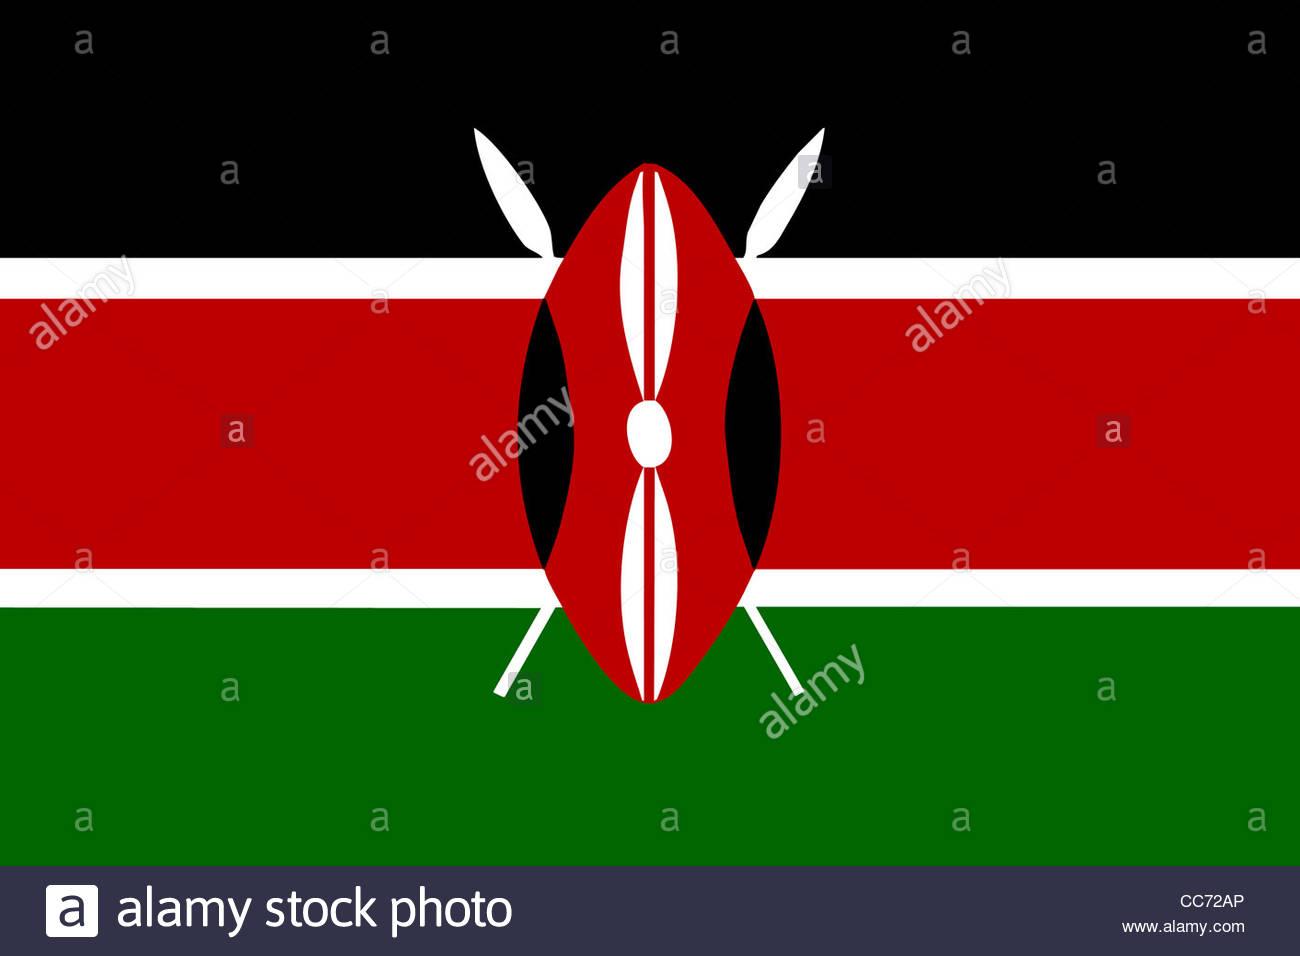 Digital Illustration - flag of Kenya Stock Photo